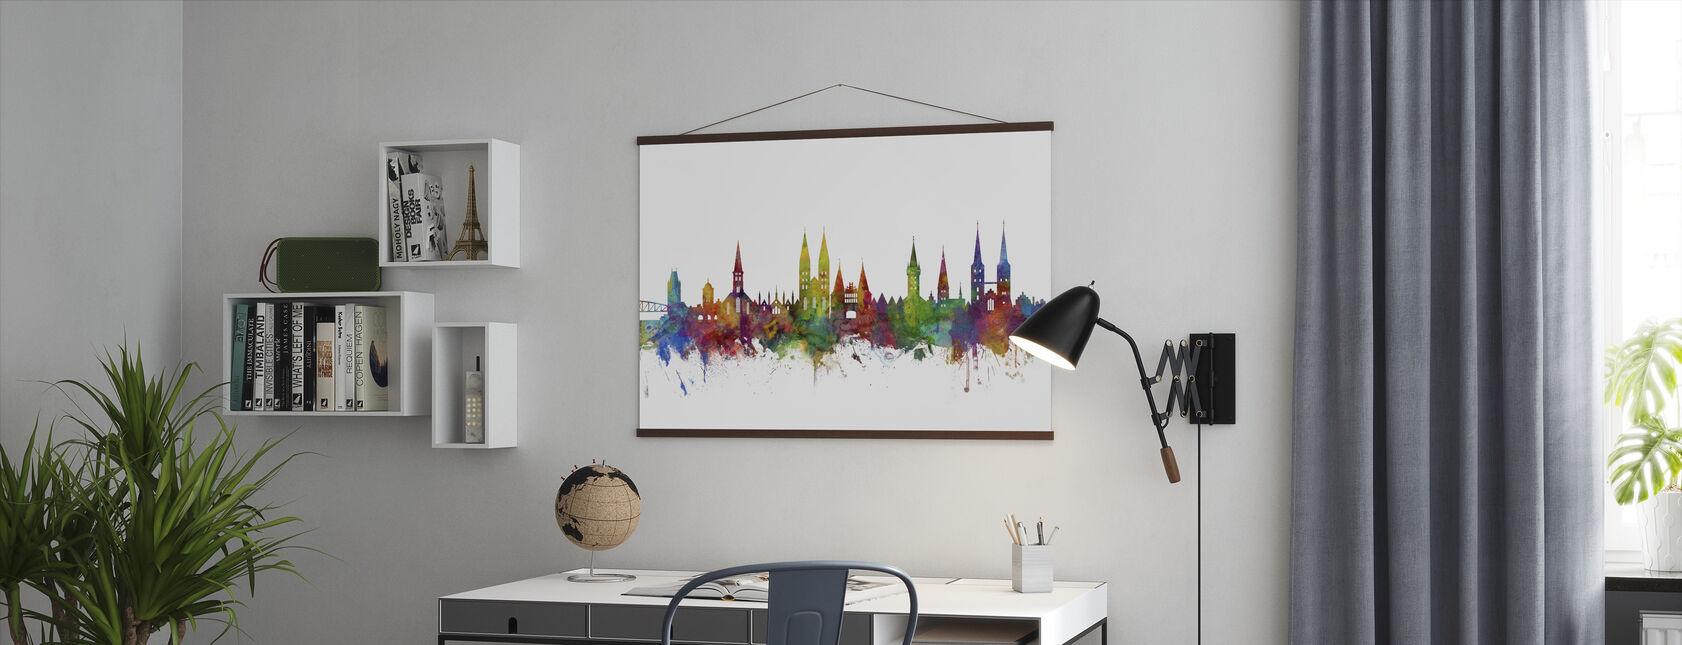 Skyline von Lu ̈ beck - Poster - Büro